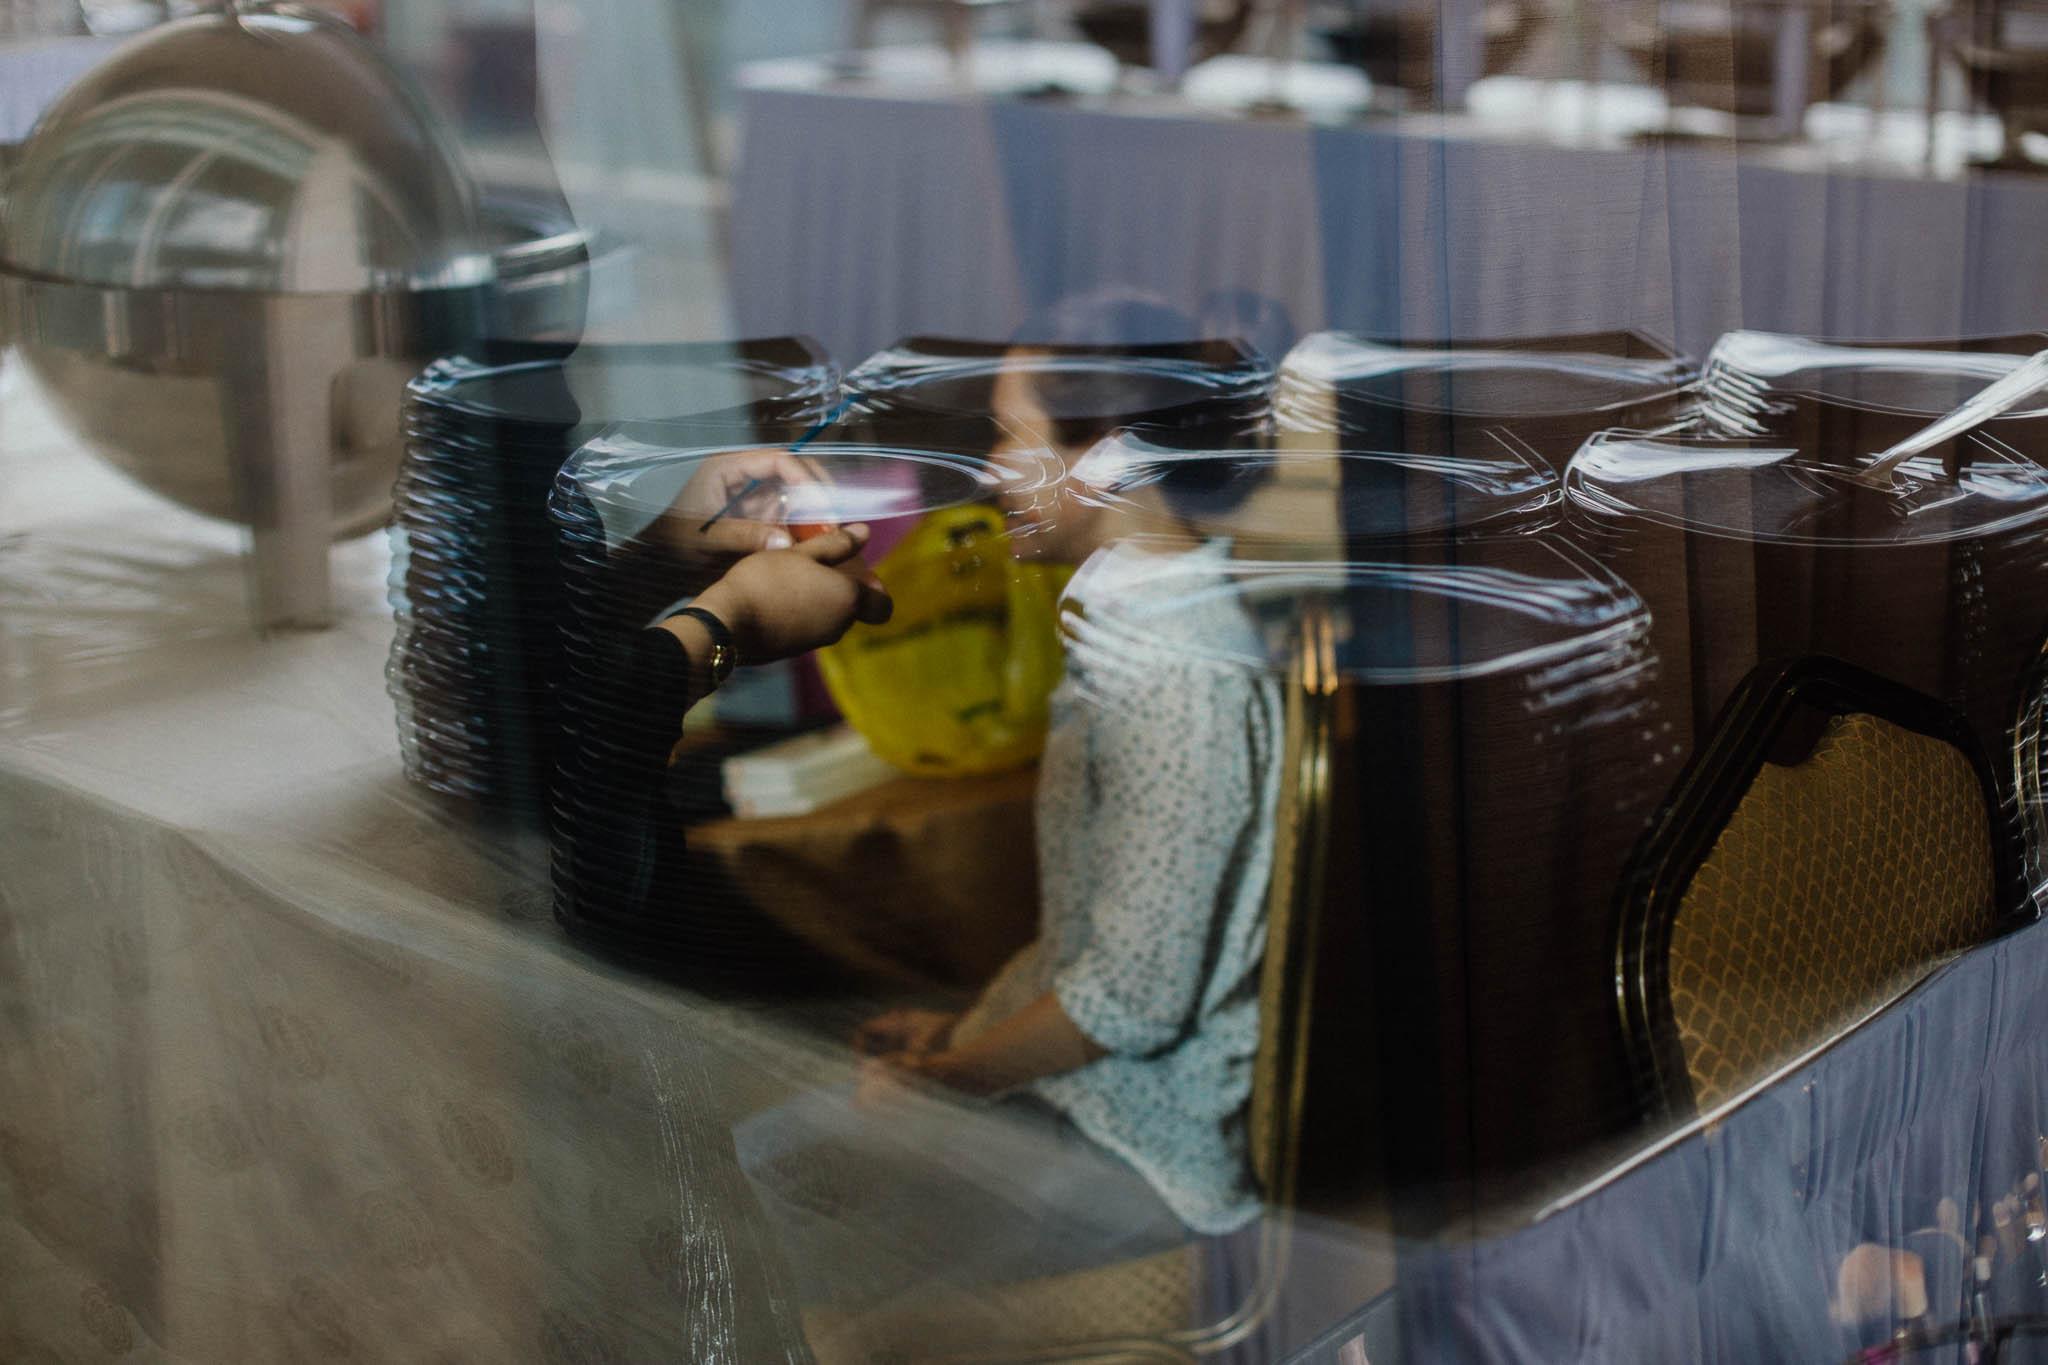 singapore-wedding-photographer-addafiq-nufail-002.jpg